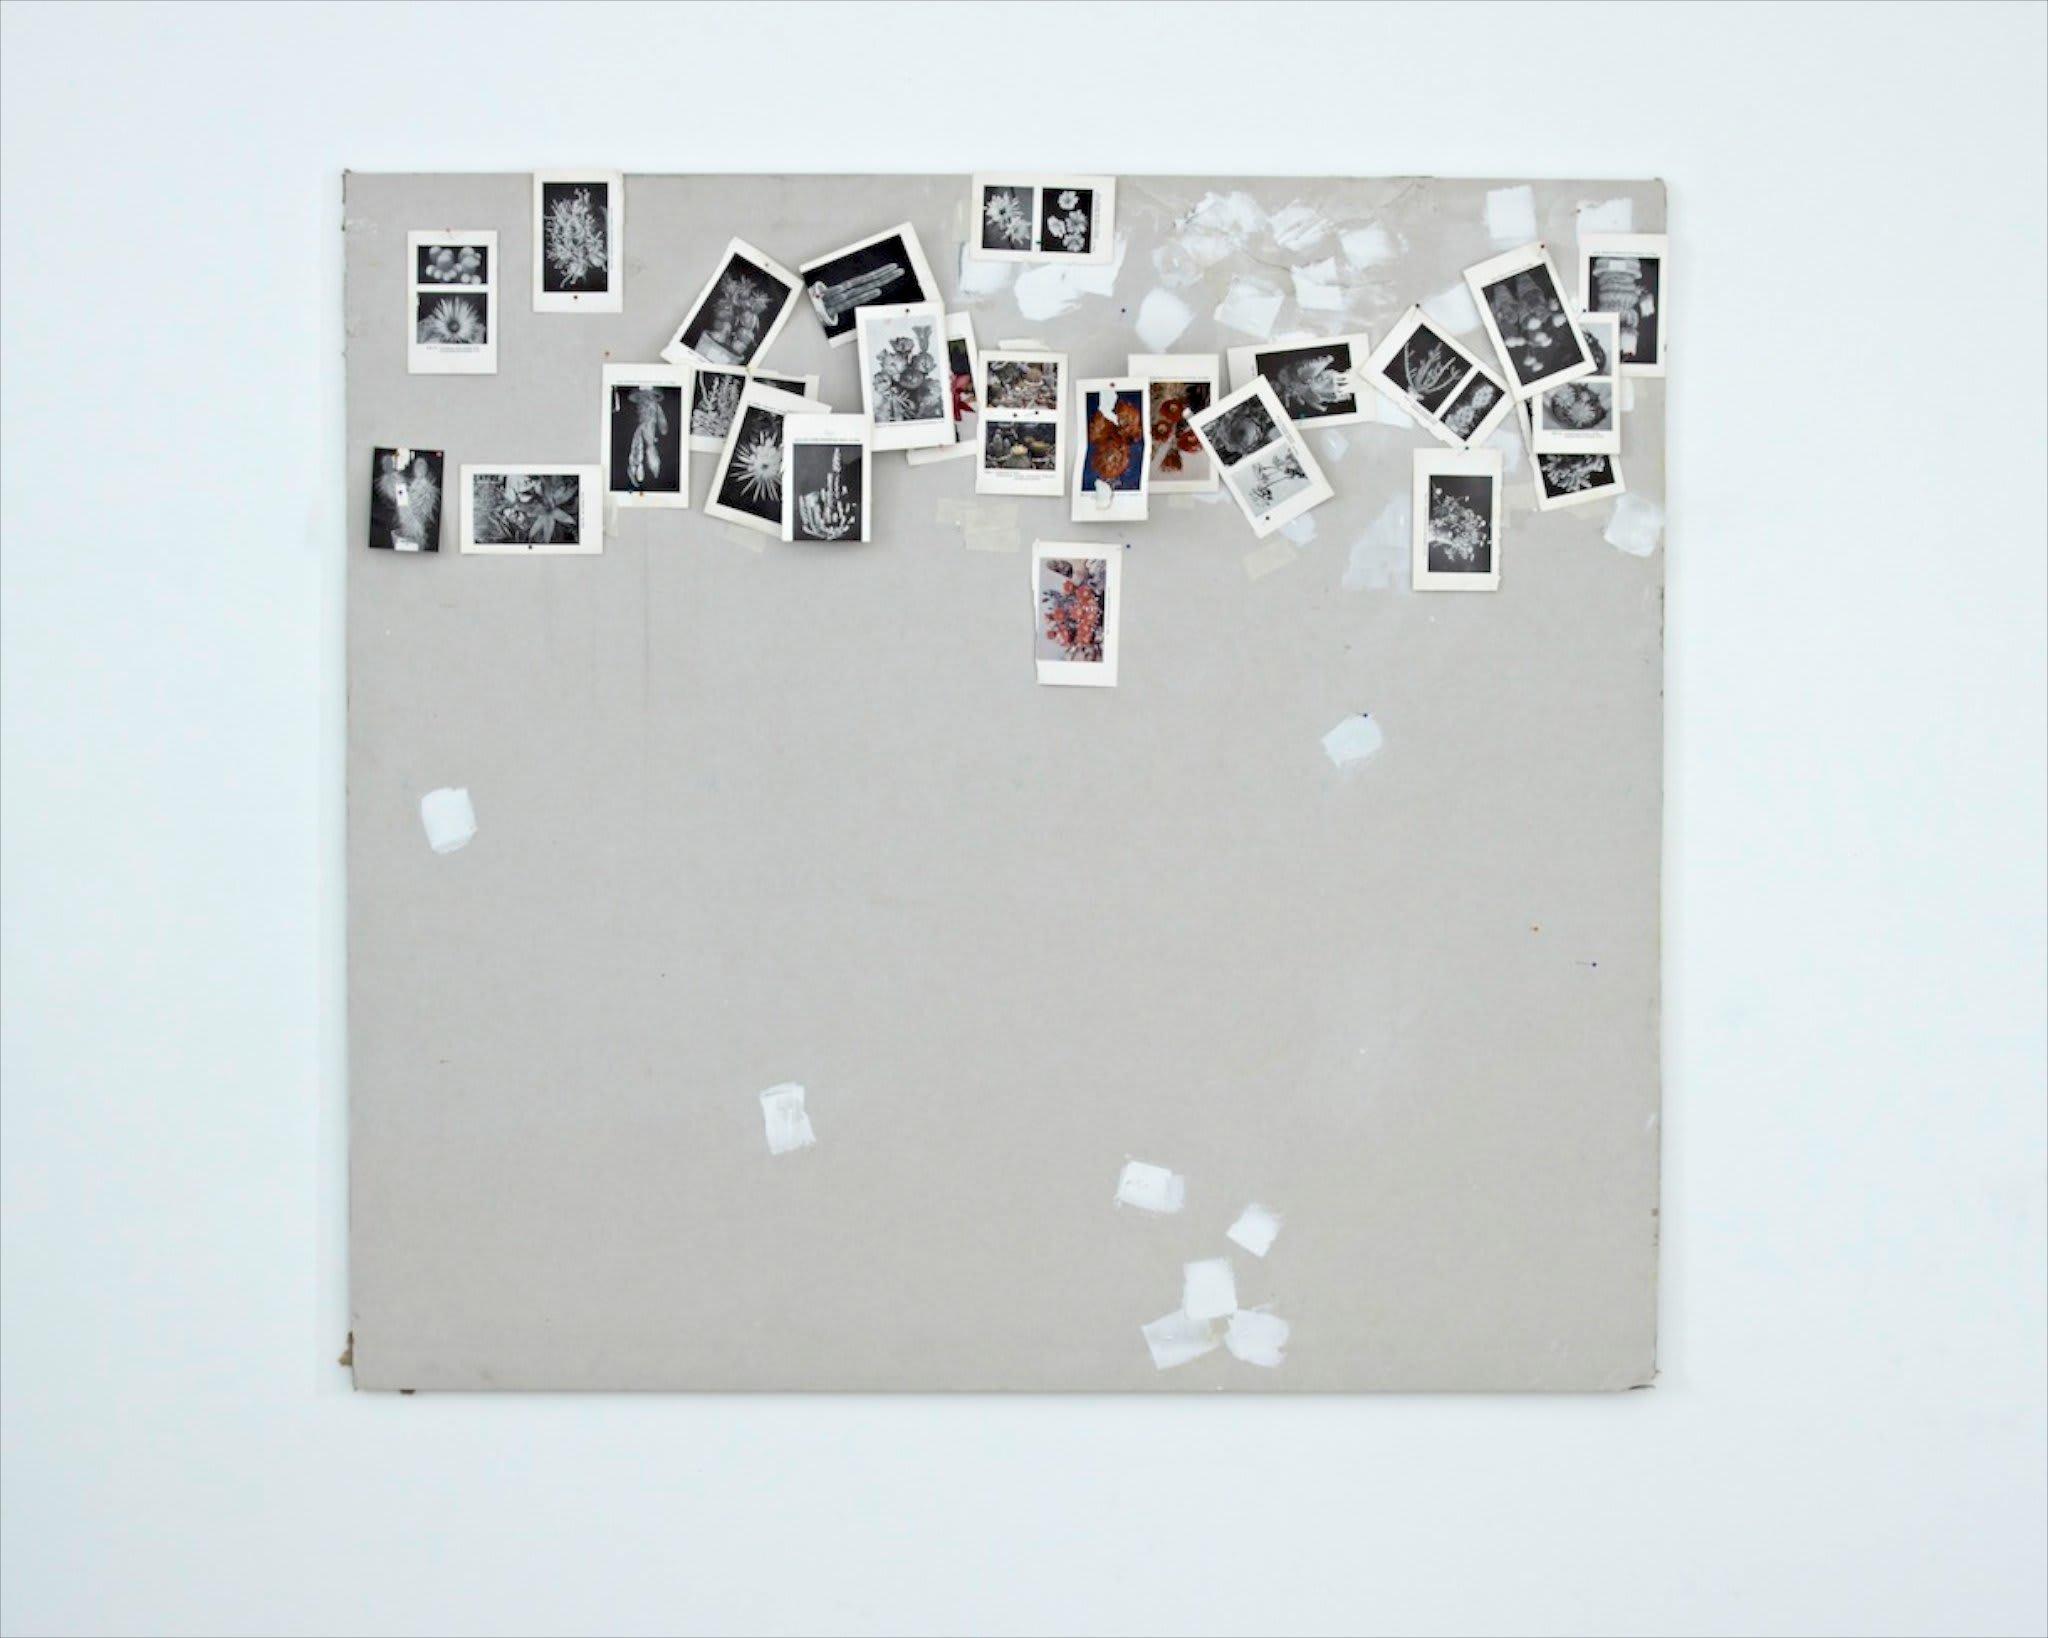 <span class=&#34;link fancybox-details-link&#34;><a href=&#34;/artists/16-paul-merrick/works/8120/&#34;>View Detail Page</a></span><div class=&#34;artist&#34;><strong>Paul Merrick</strong></div> <div class=&#34;title&#34;>Untitled, 2013</div> <div class=&#34;medium&#34;>Plasterboard, filler, masking tape, found images, dress maker pins</div> <div class=&#34;dimensions&#34;>120 x 130 cm<br />47 1/4 x 51 1/8 in</div><div class=&#34;copyright_line&#34;>Copyright The Artist</div>